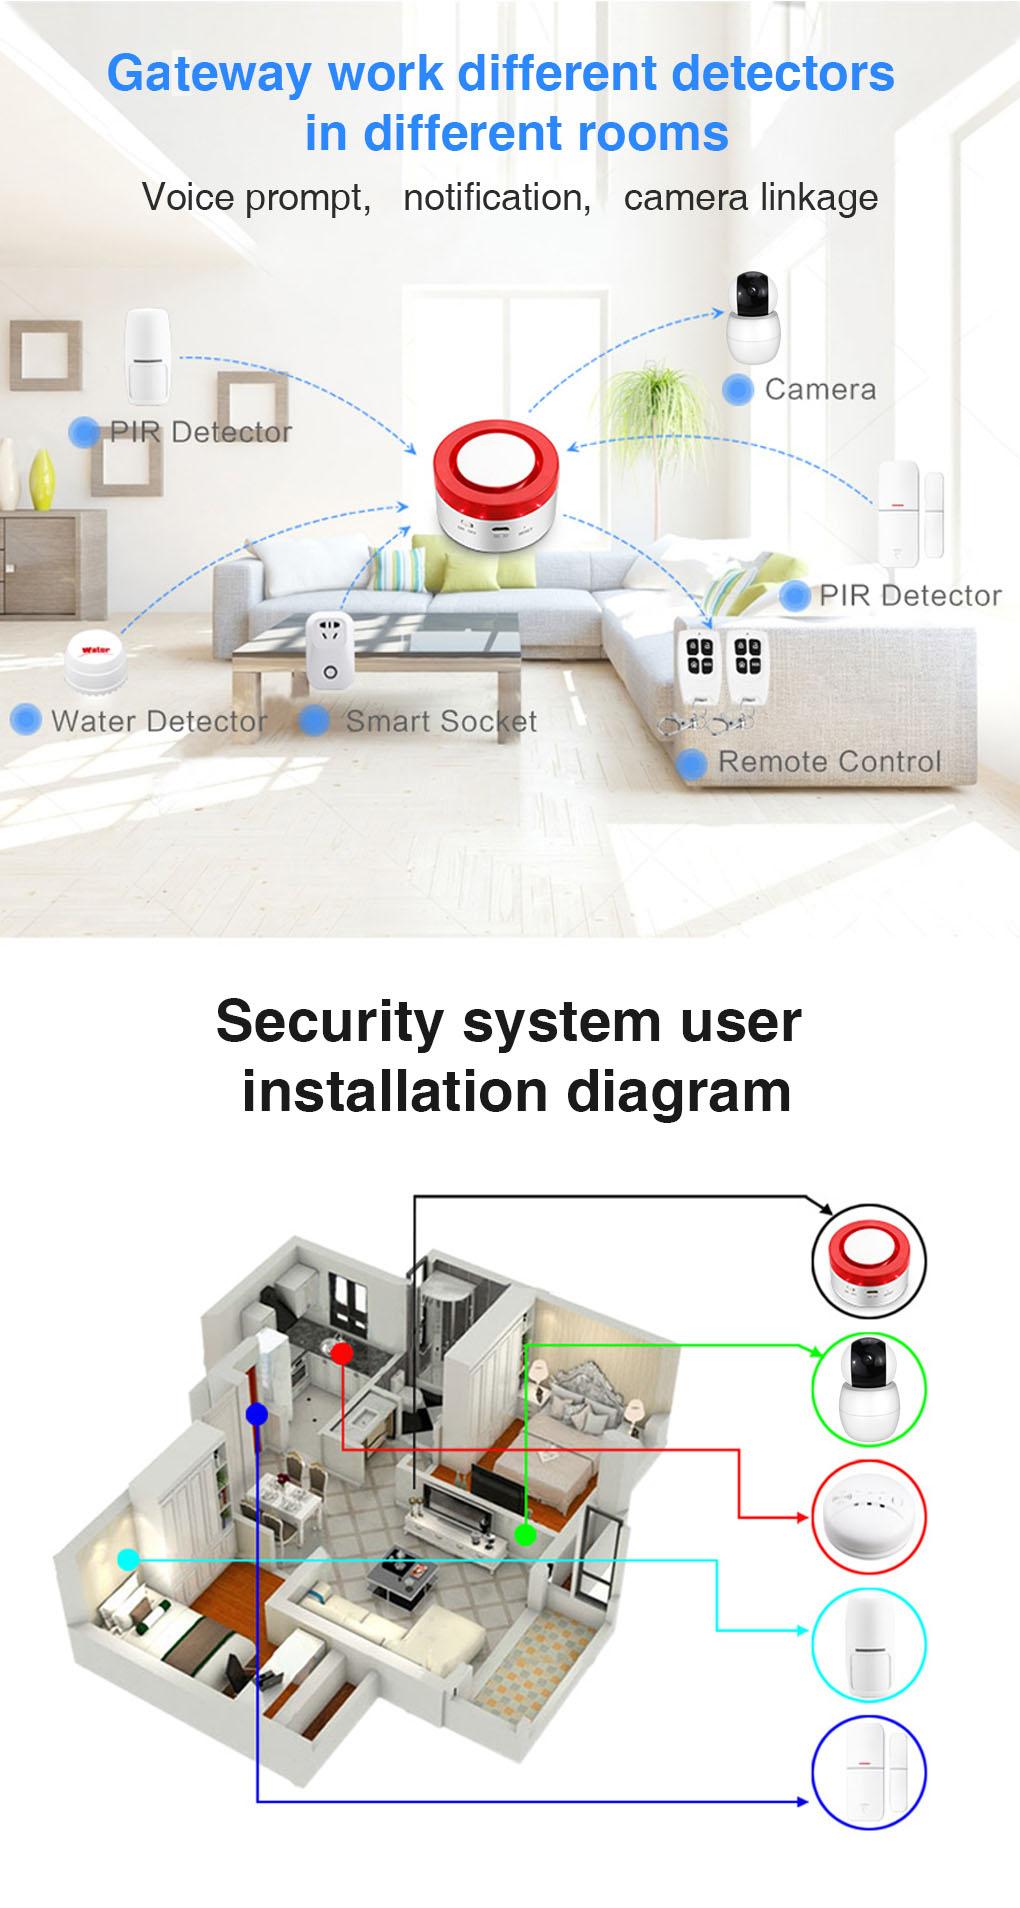 Enerna IoTech 2 in 1 WiFi Smart Automation Home Security Siren Alarm IoT Gateway